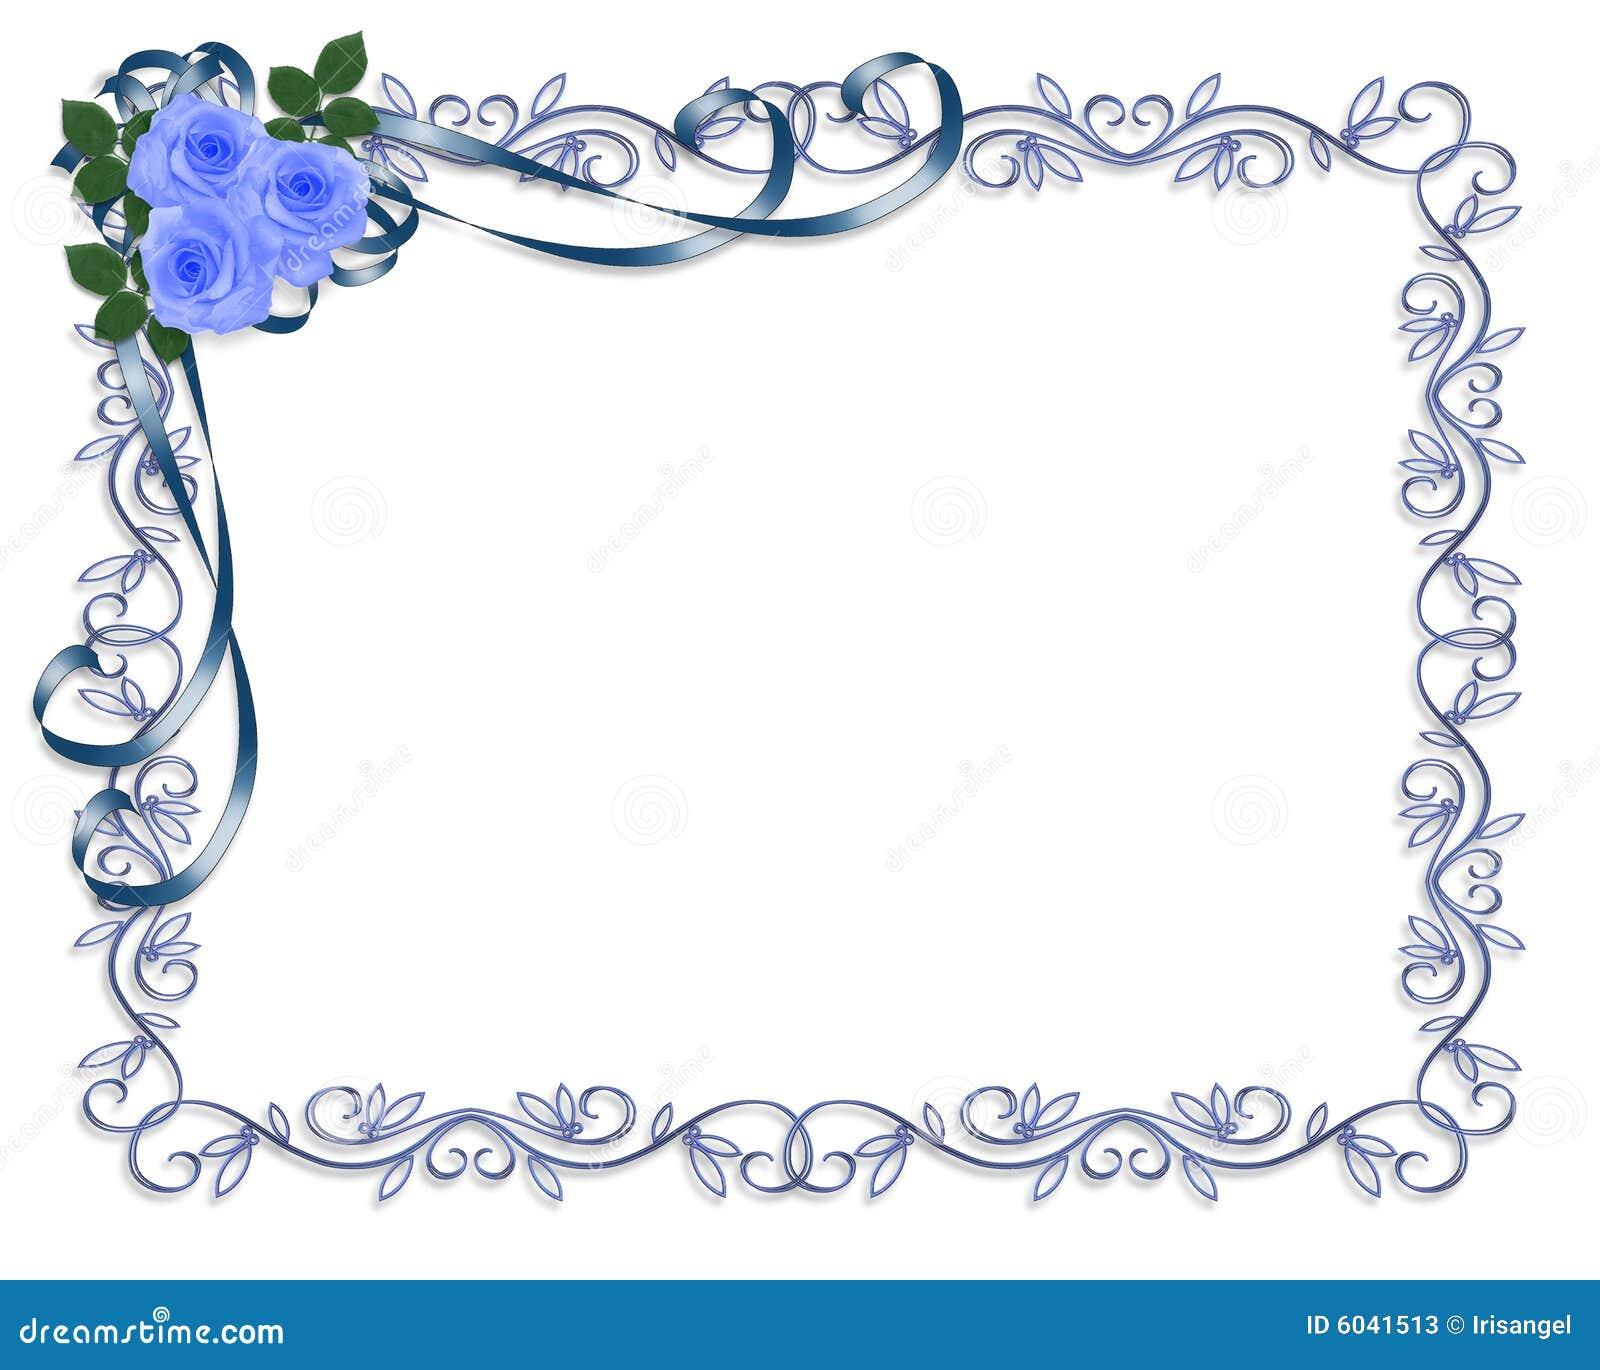 Rosas azules wedding la invitaci n o la tarjeta del d a de - Decoracion con marcos ...